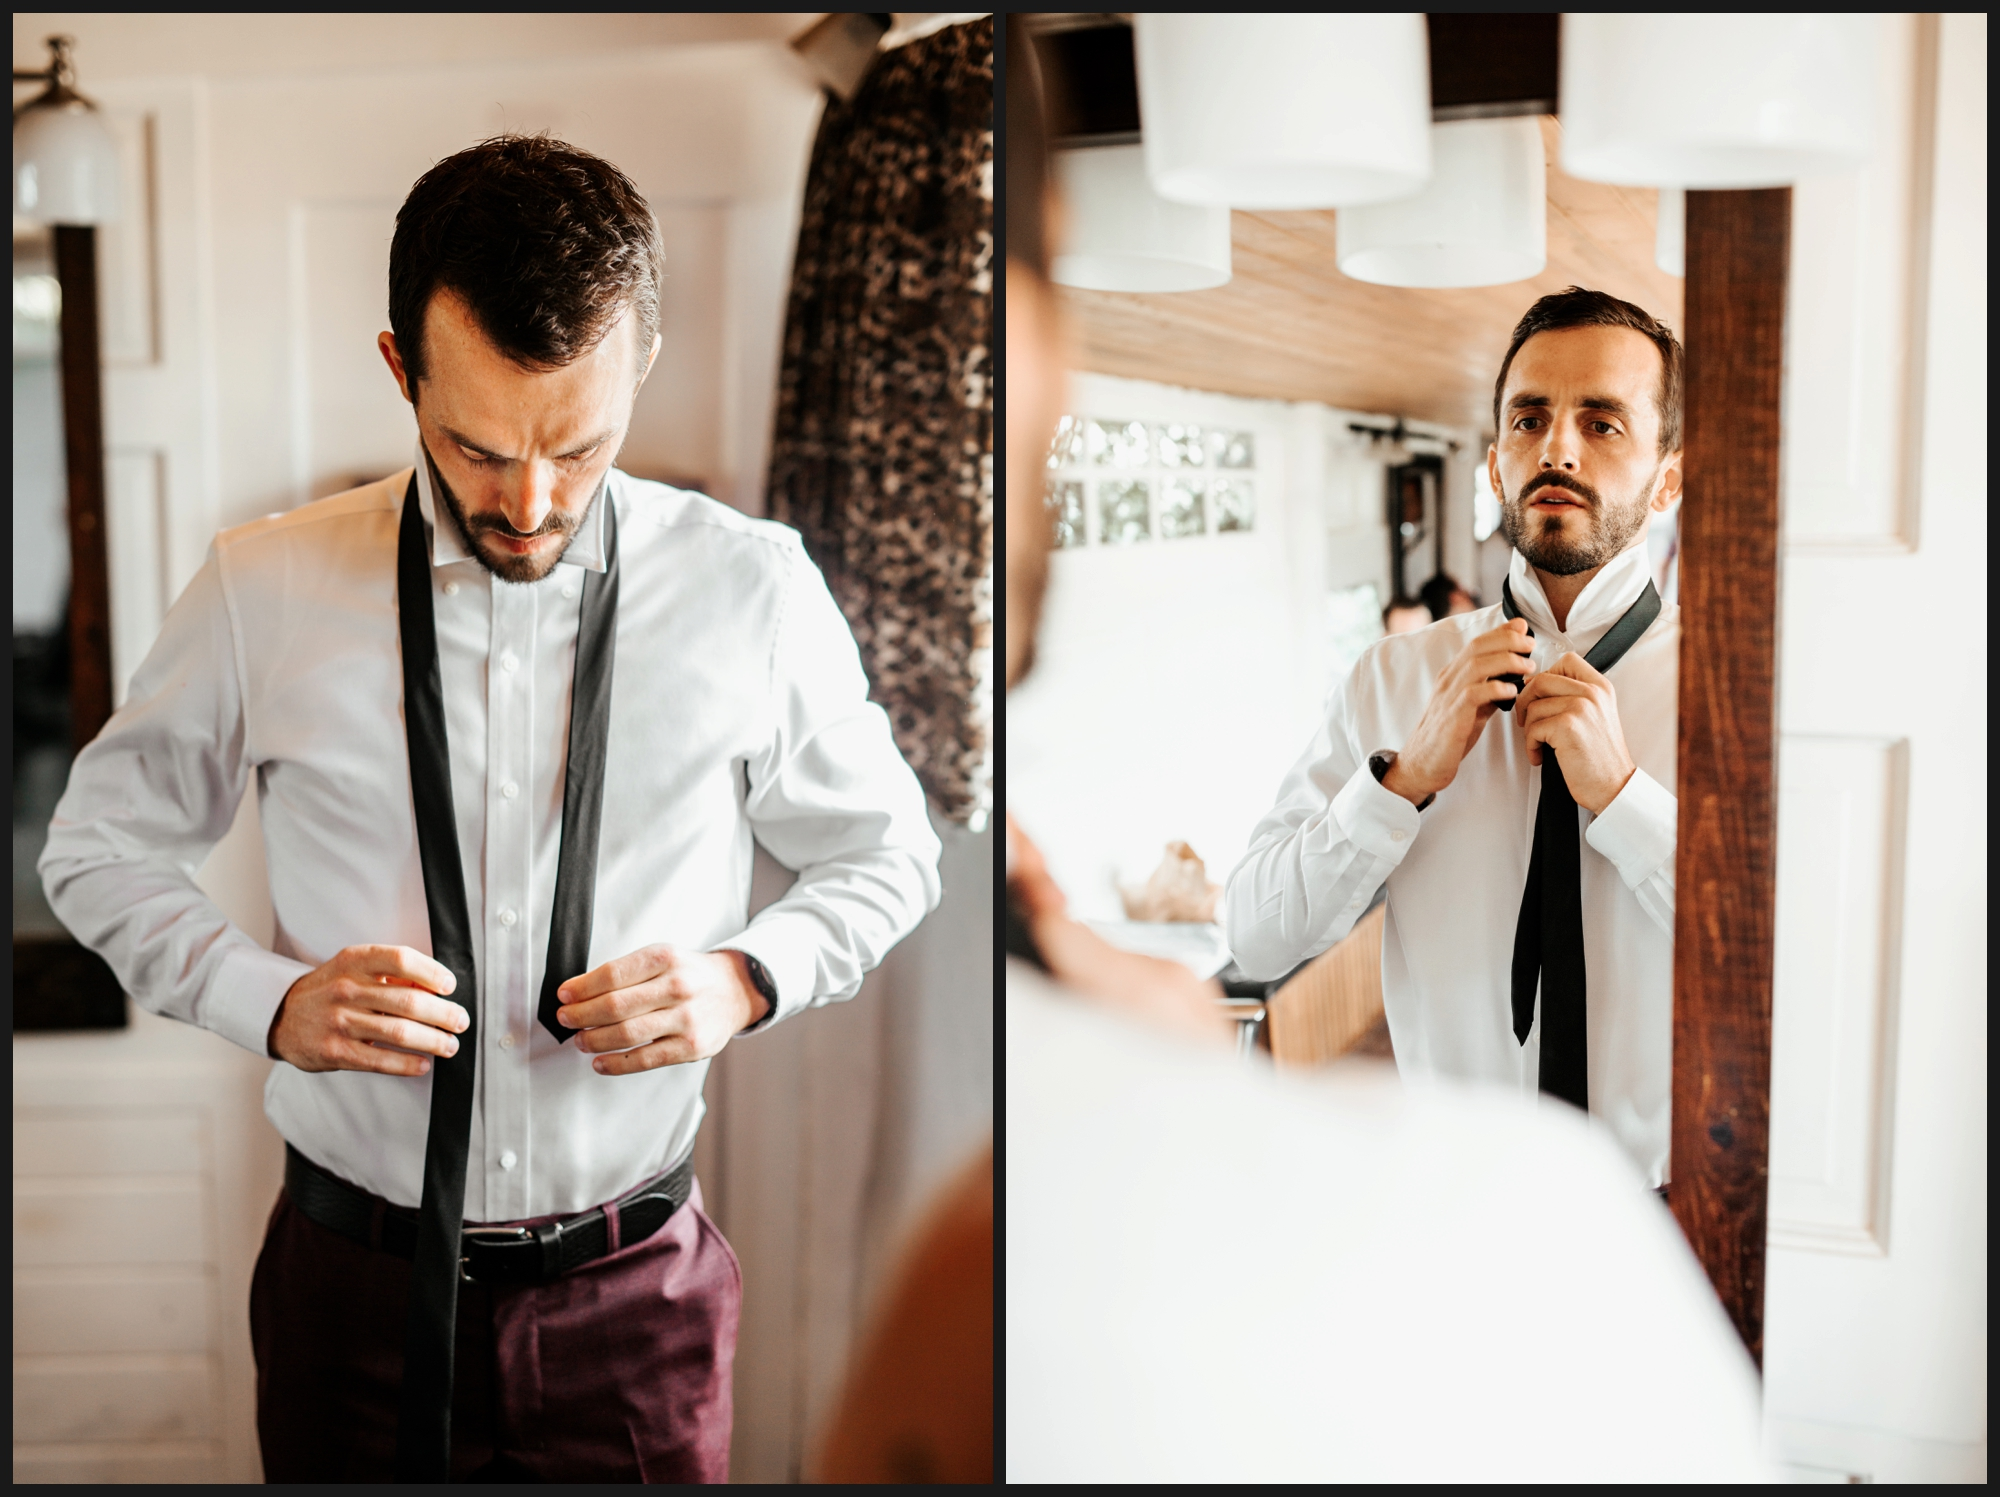 Orlando-Wedding-Photographer-destination-wedding-photographer-florida-wedding-photographer-bohemian-wedding-photographer_1940.jpg